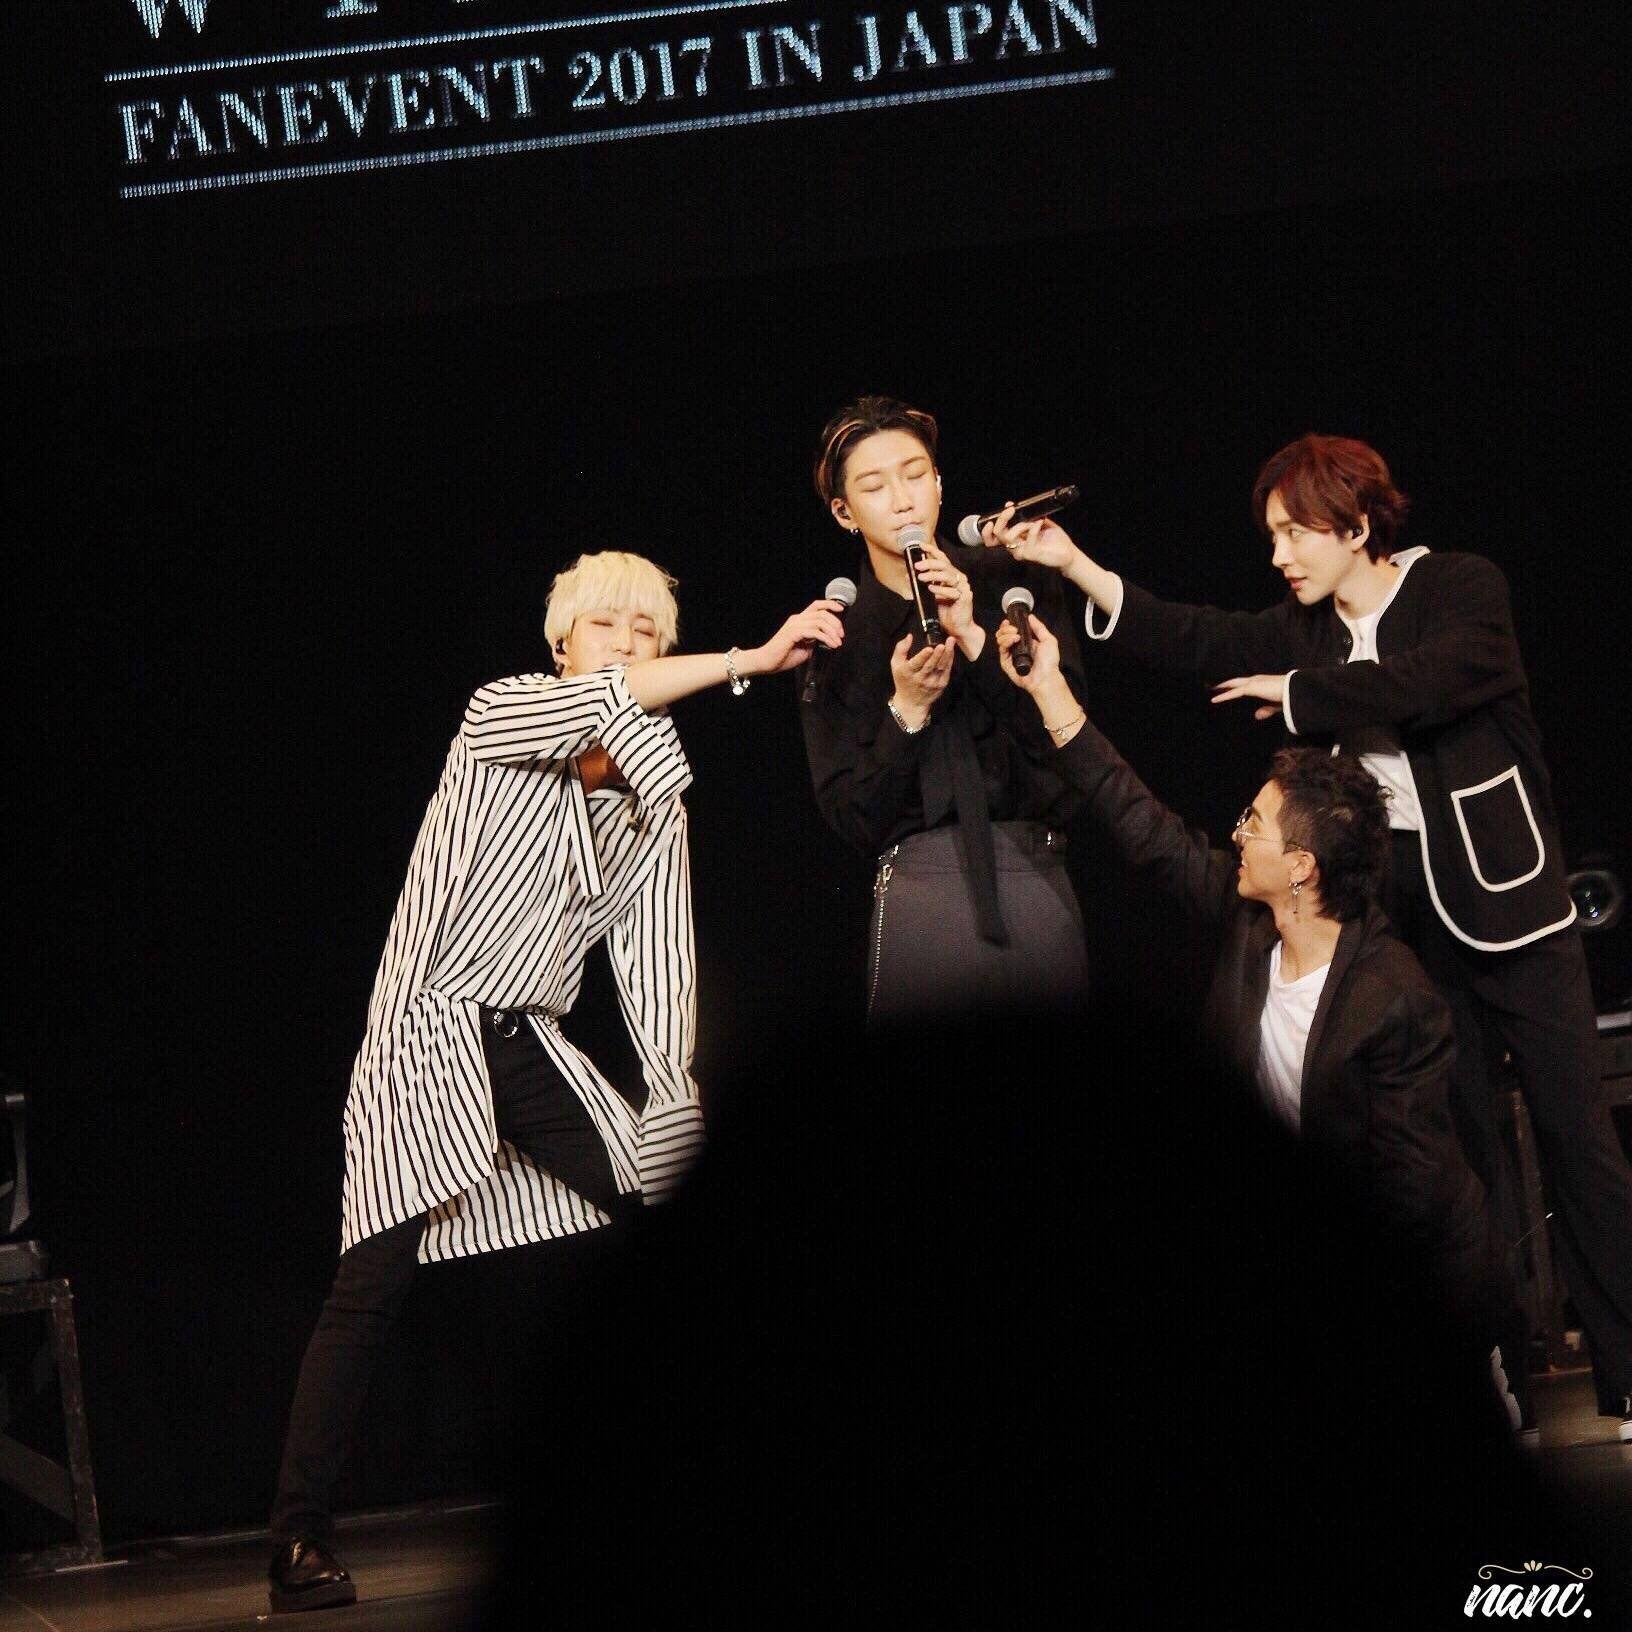 "nanc_rika on Twitter: ""6/10 winner Tokyo FM in CHIBA PHOTO Part3 Please no edit。 위너 김진우 이승훈 송민호 강승윤 https://t.co/ixmuRjsufM"""